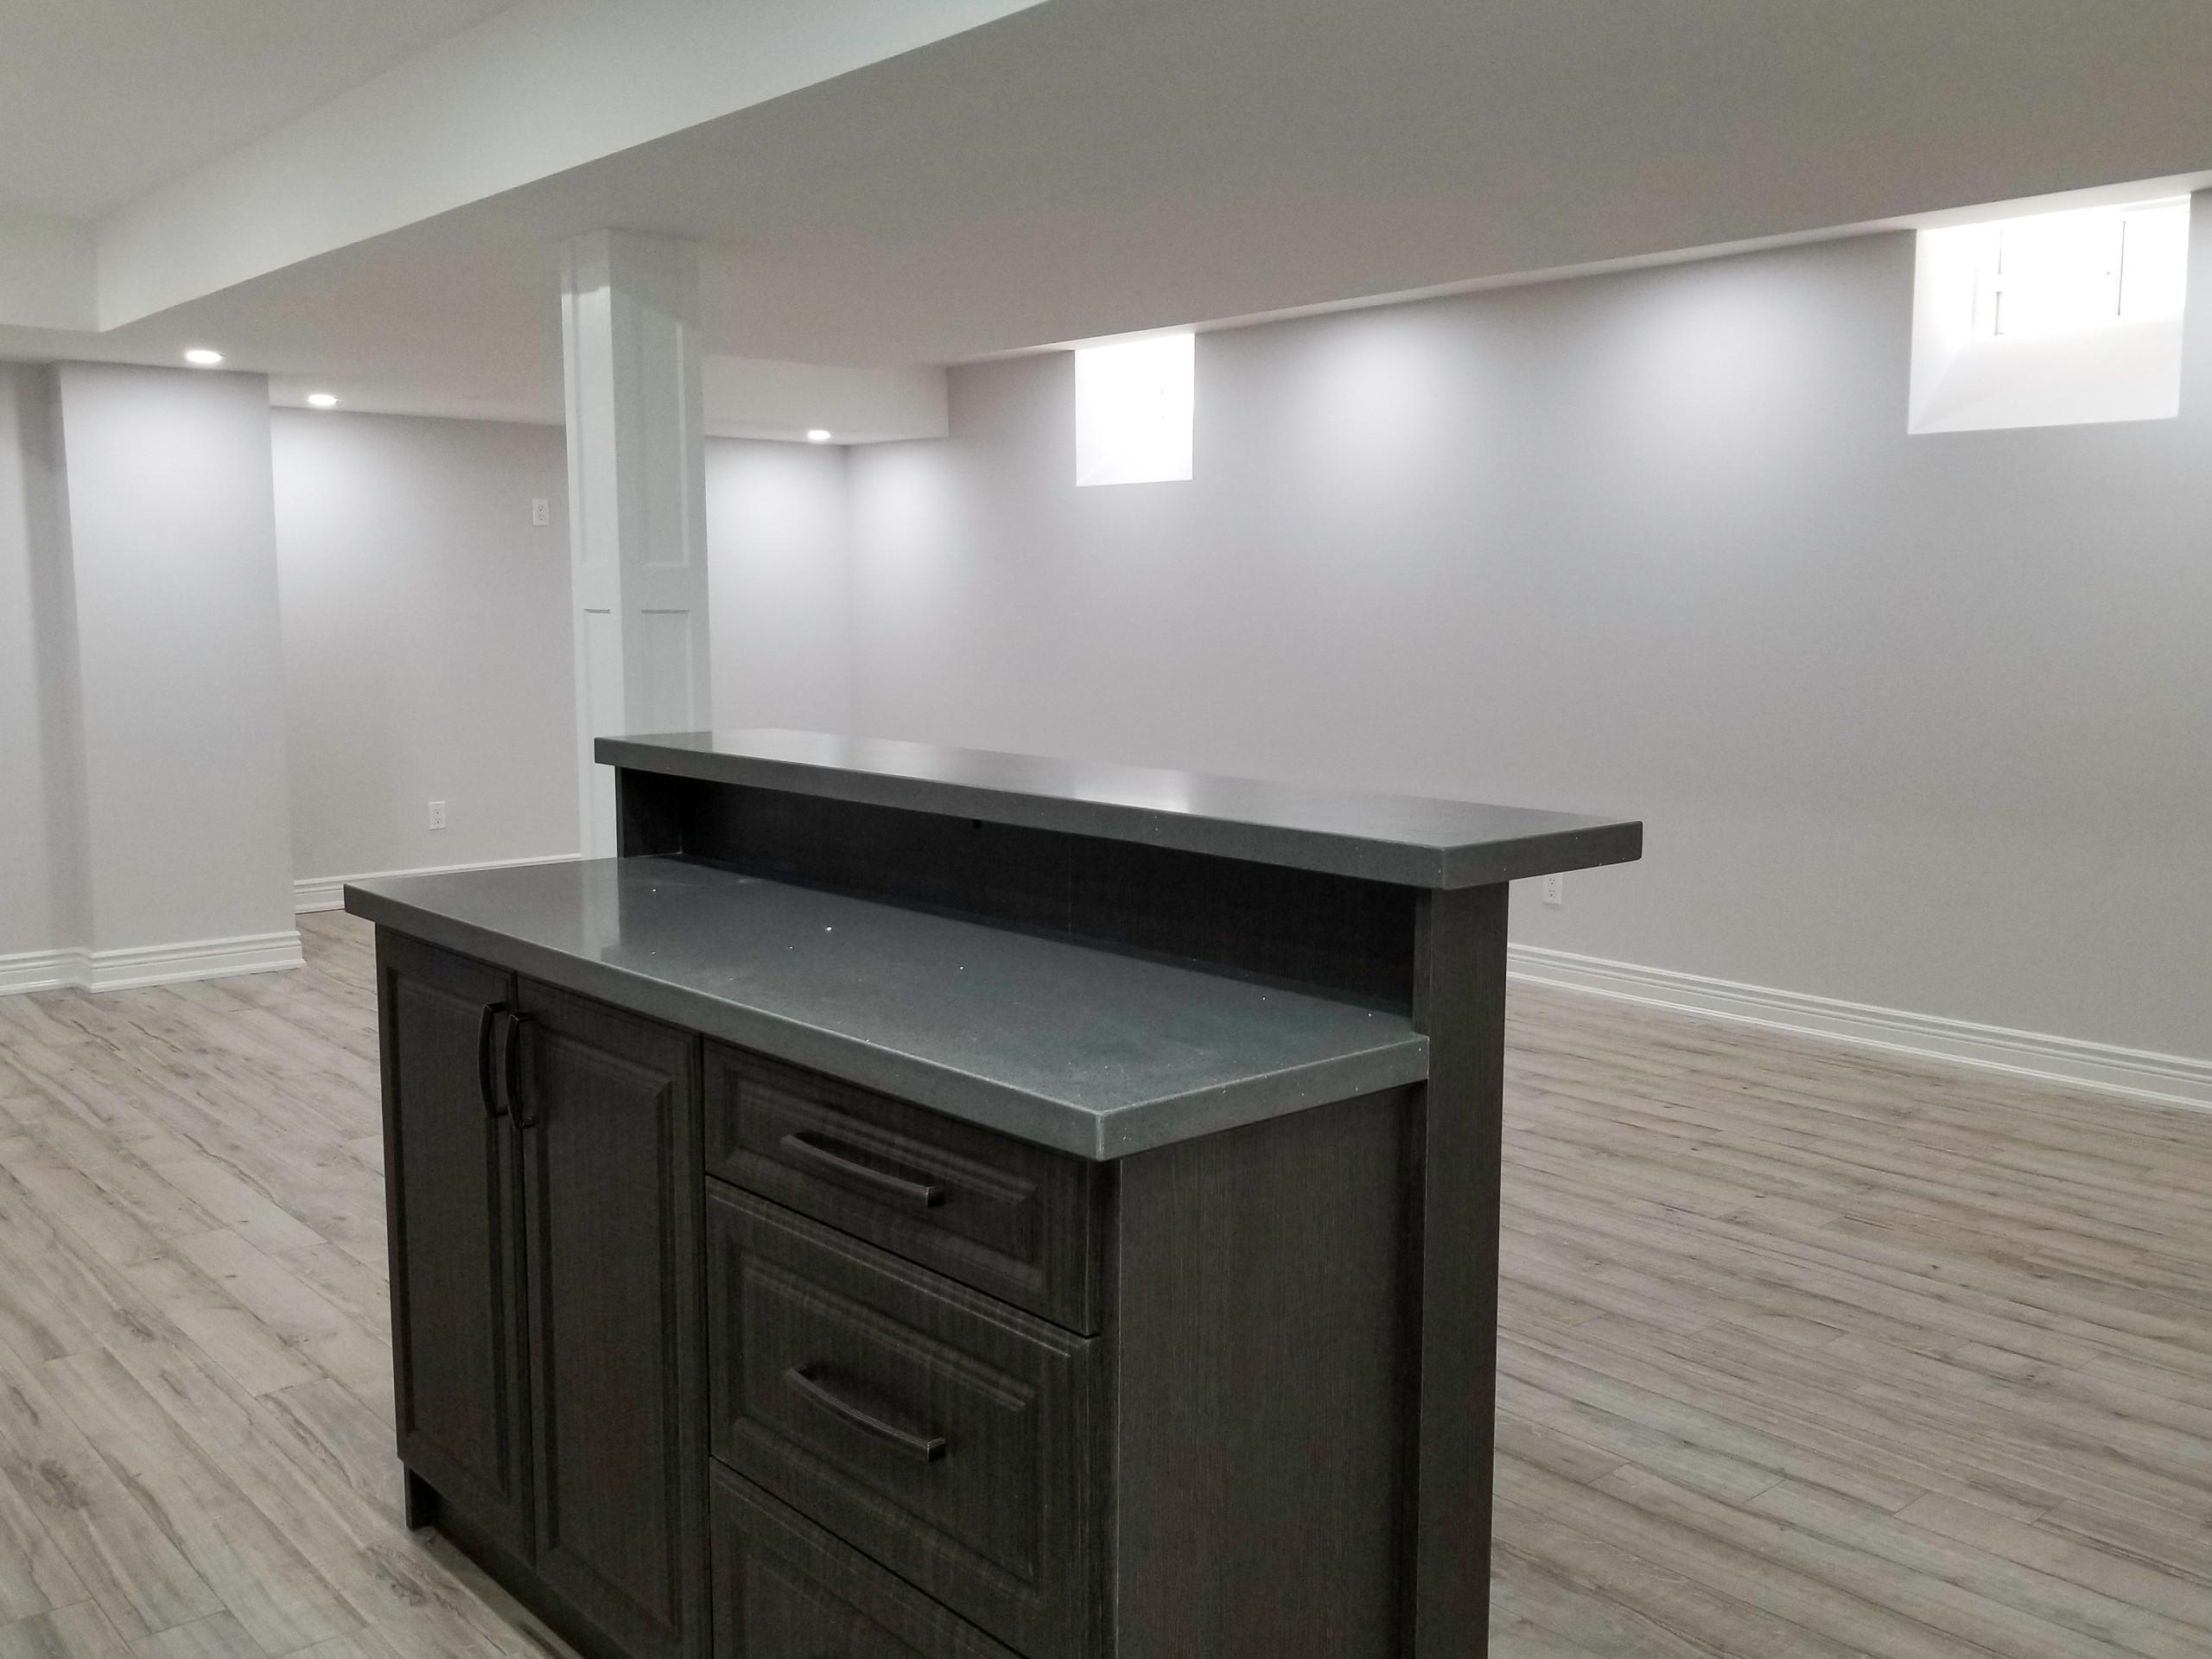 Basement Remodel and Interior Design